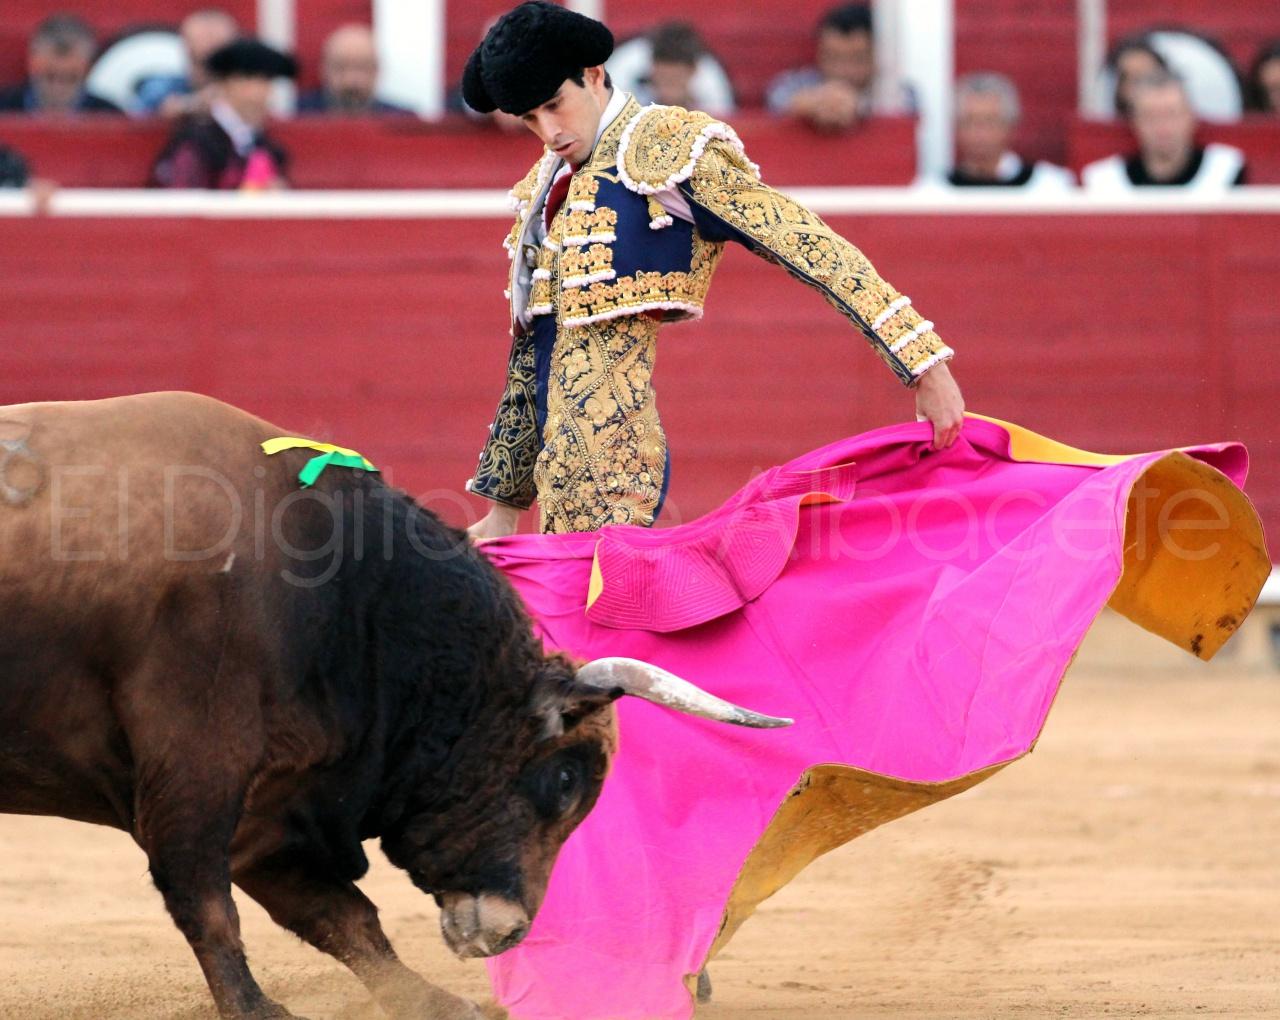 El Juli Lopez Simon y Garrido Feria Albacete 2015 toros  116